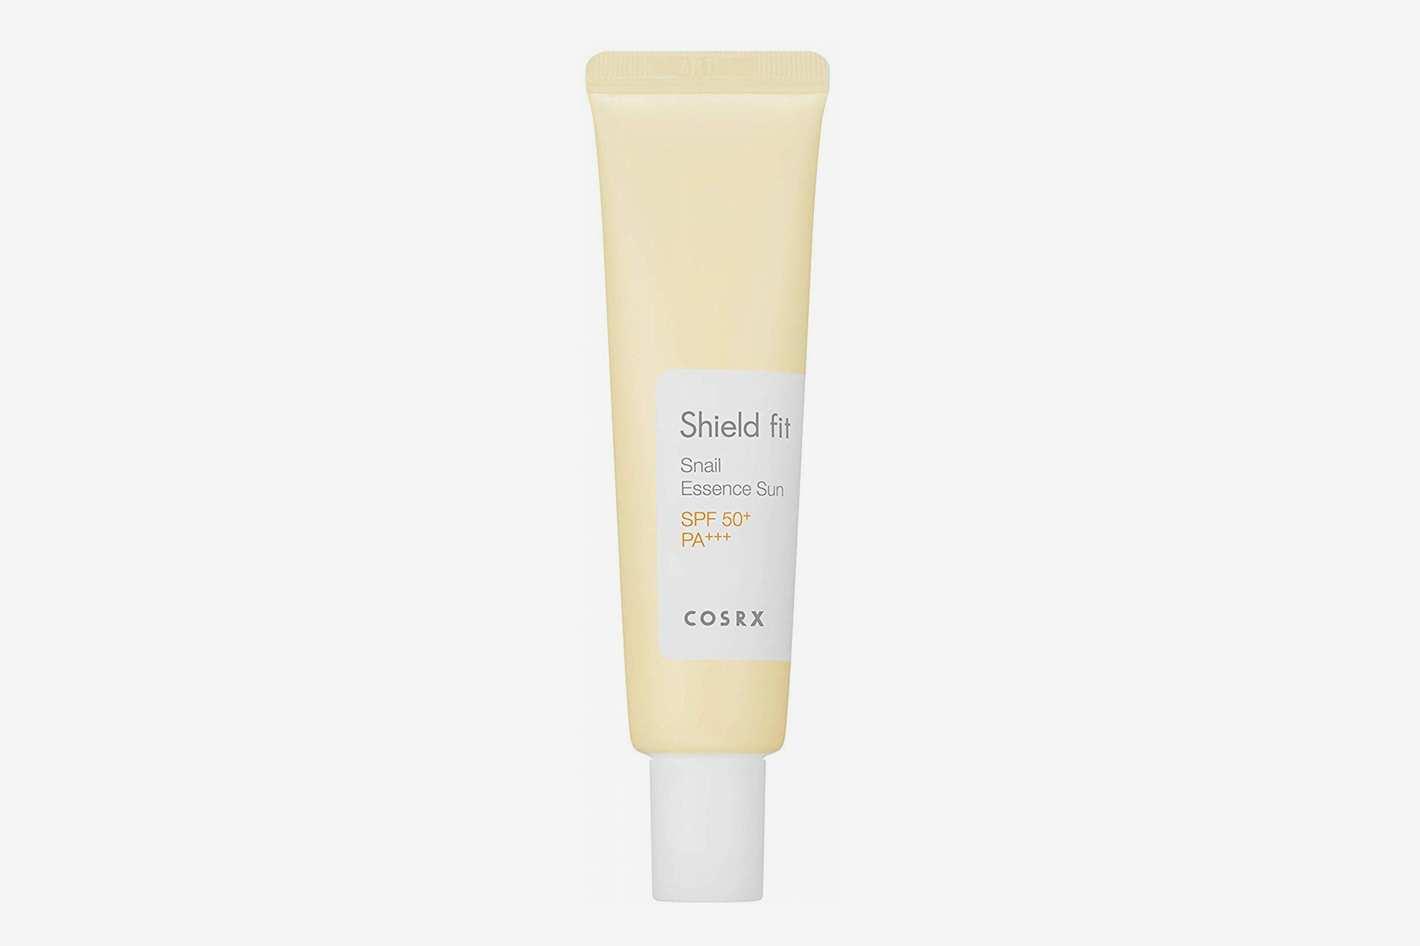 Cosrx Shield Fit Snail Essence Sun SPF50+